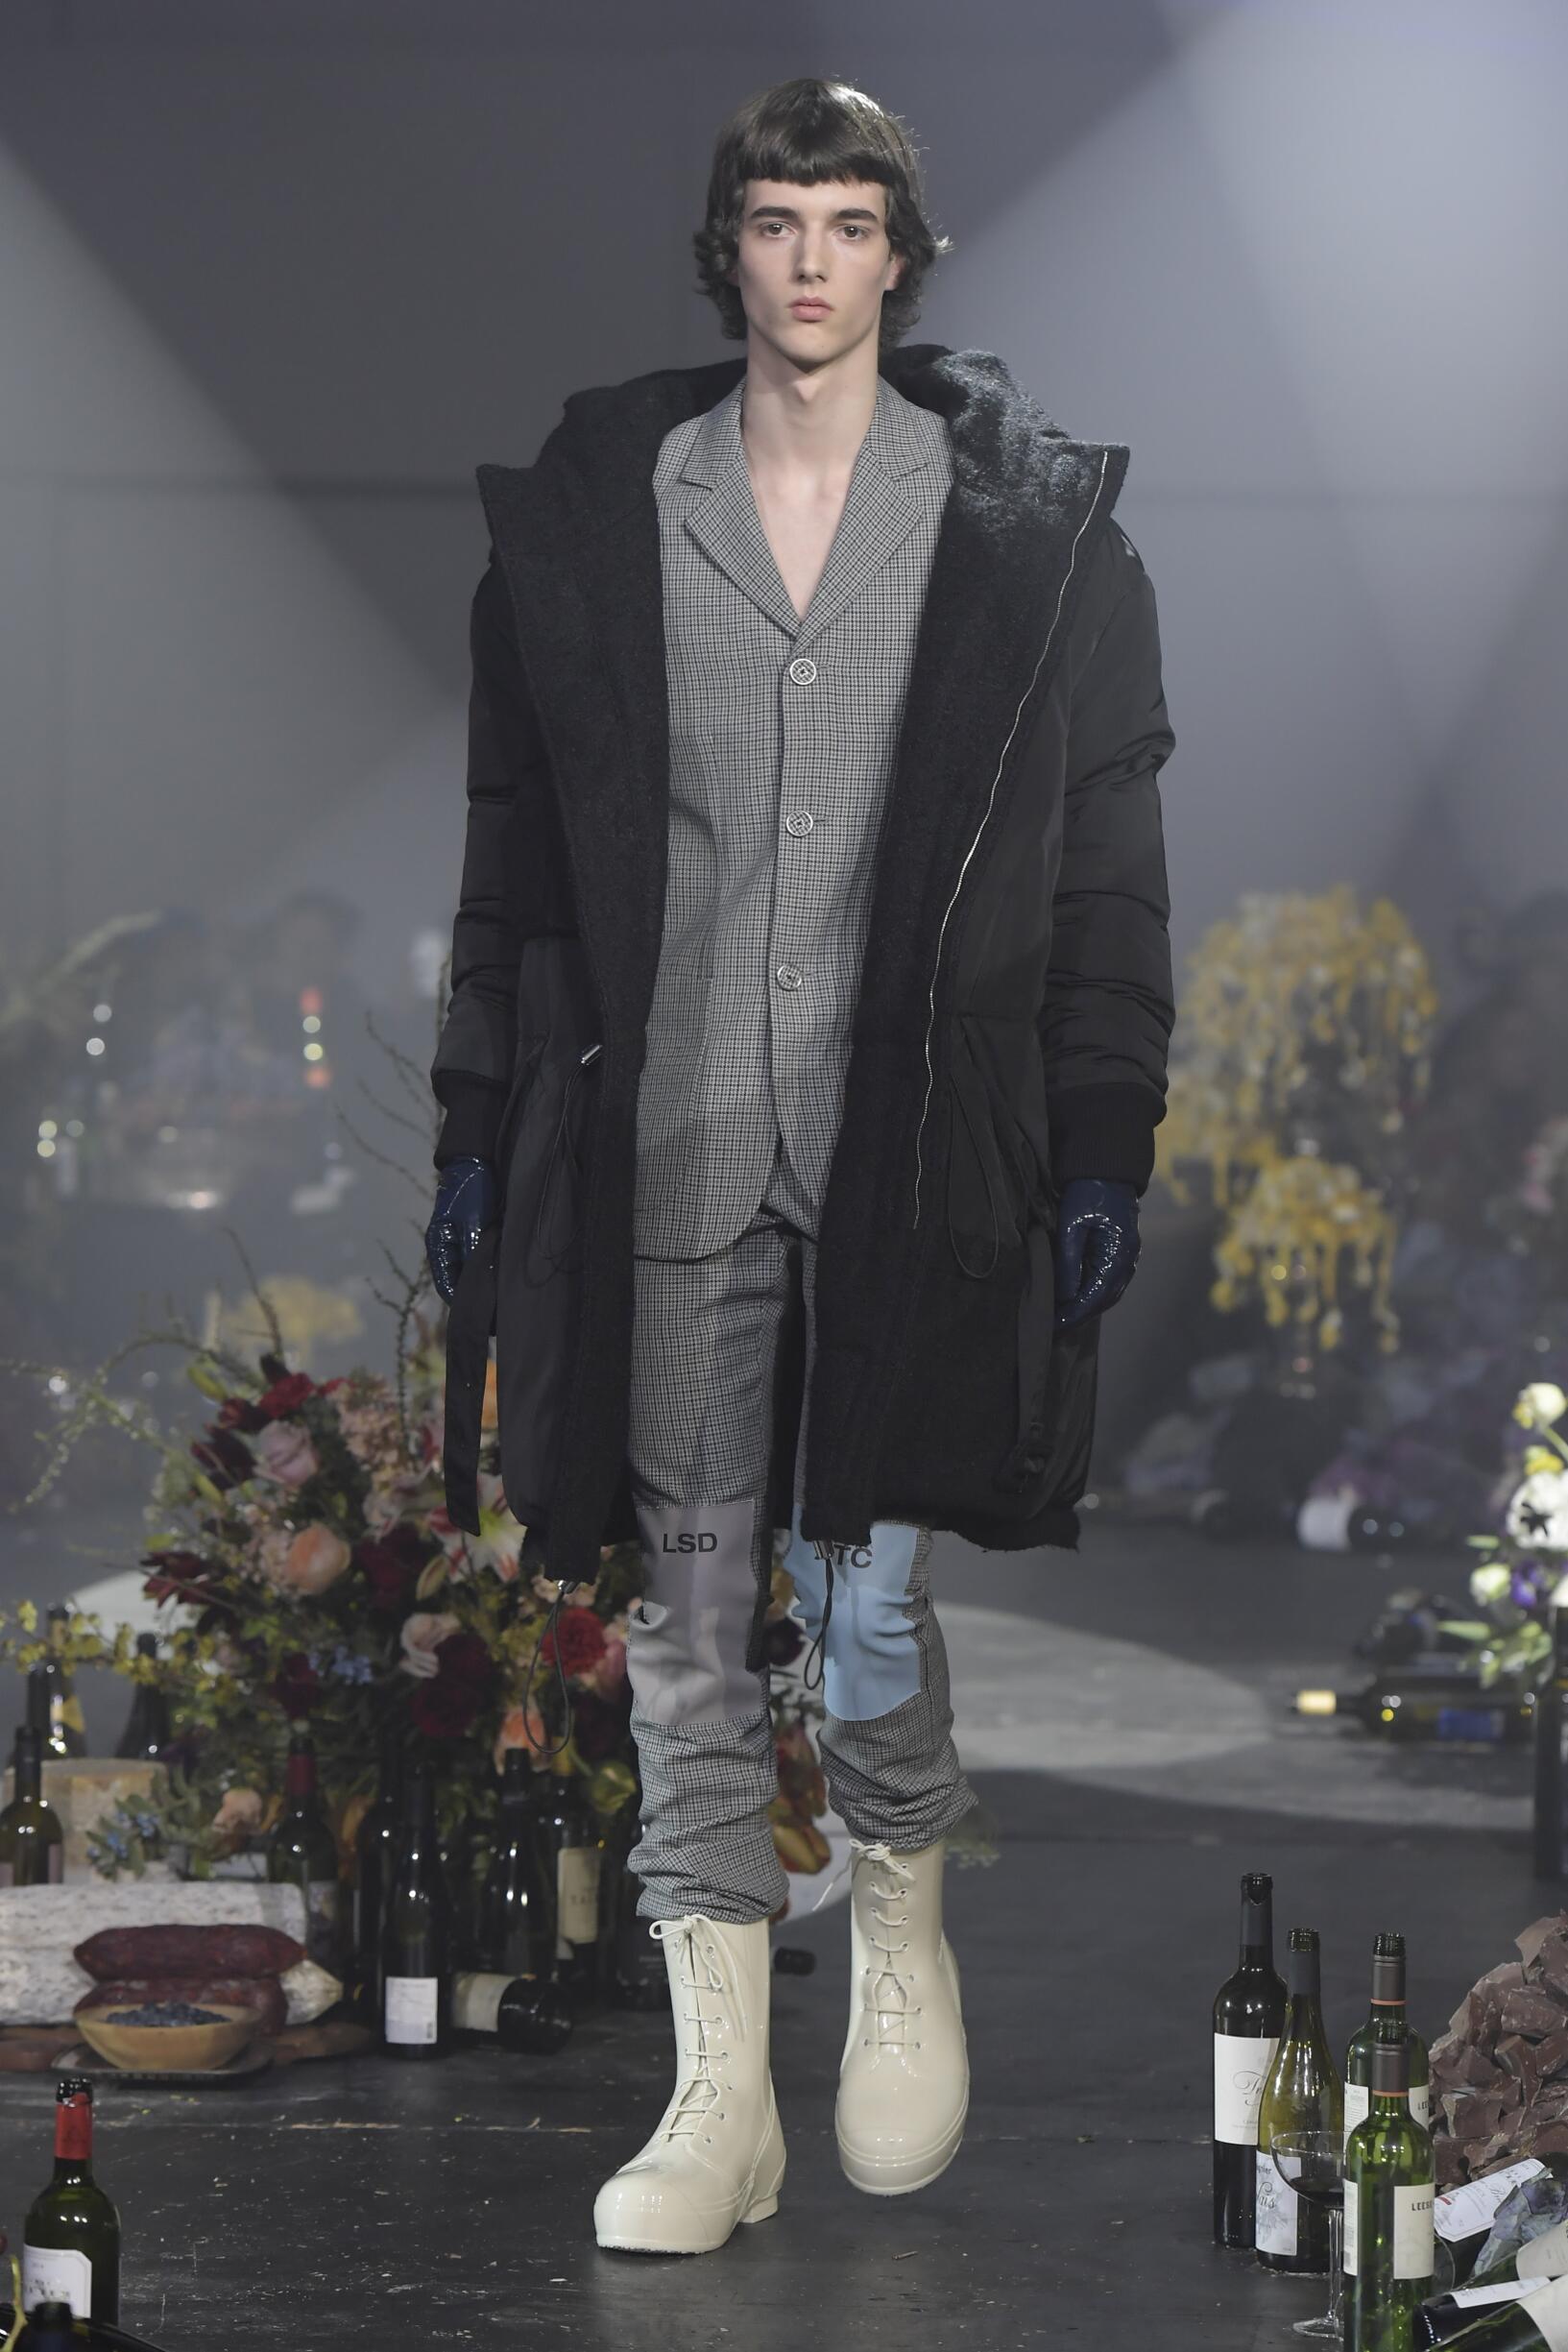 Fashion Model Raf Simons Catwalk